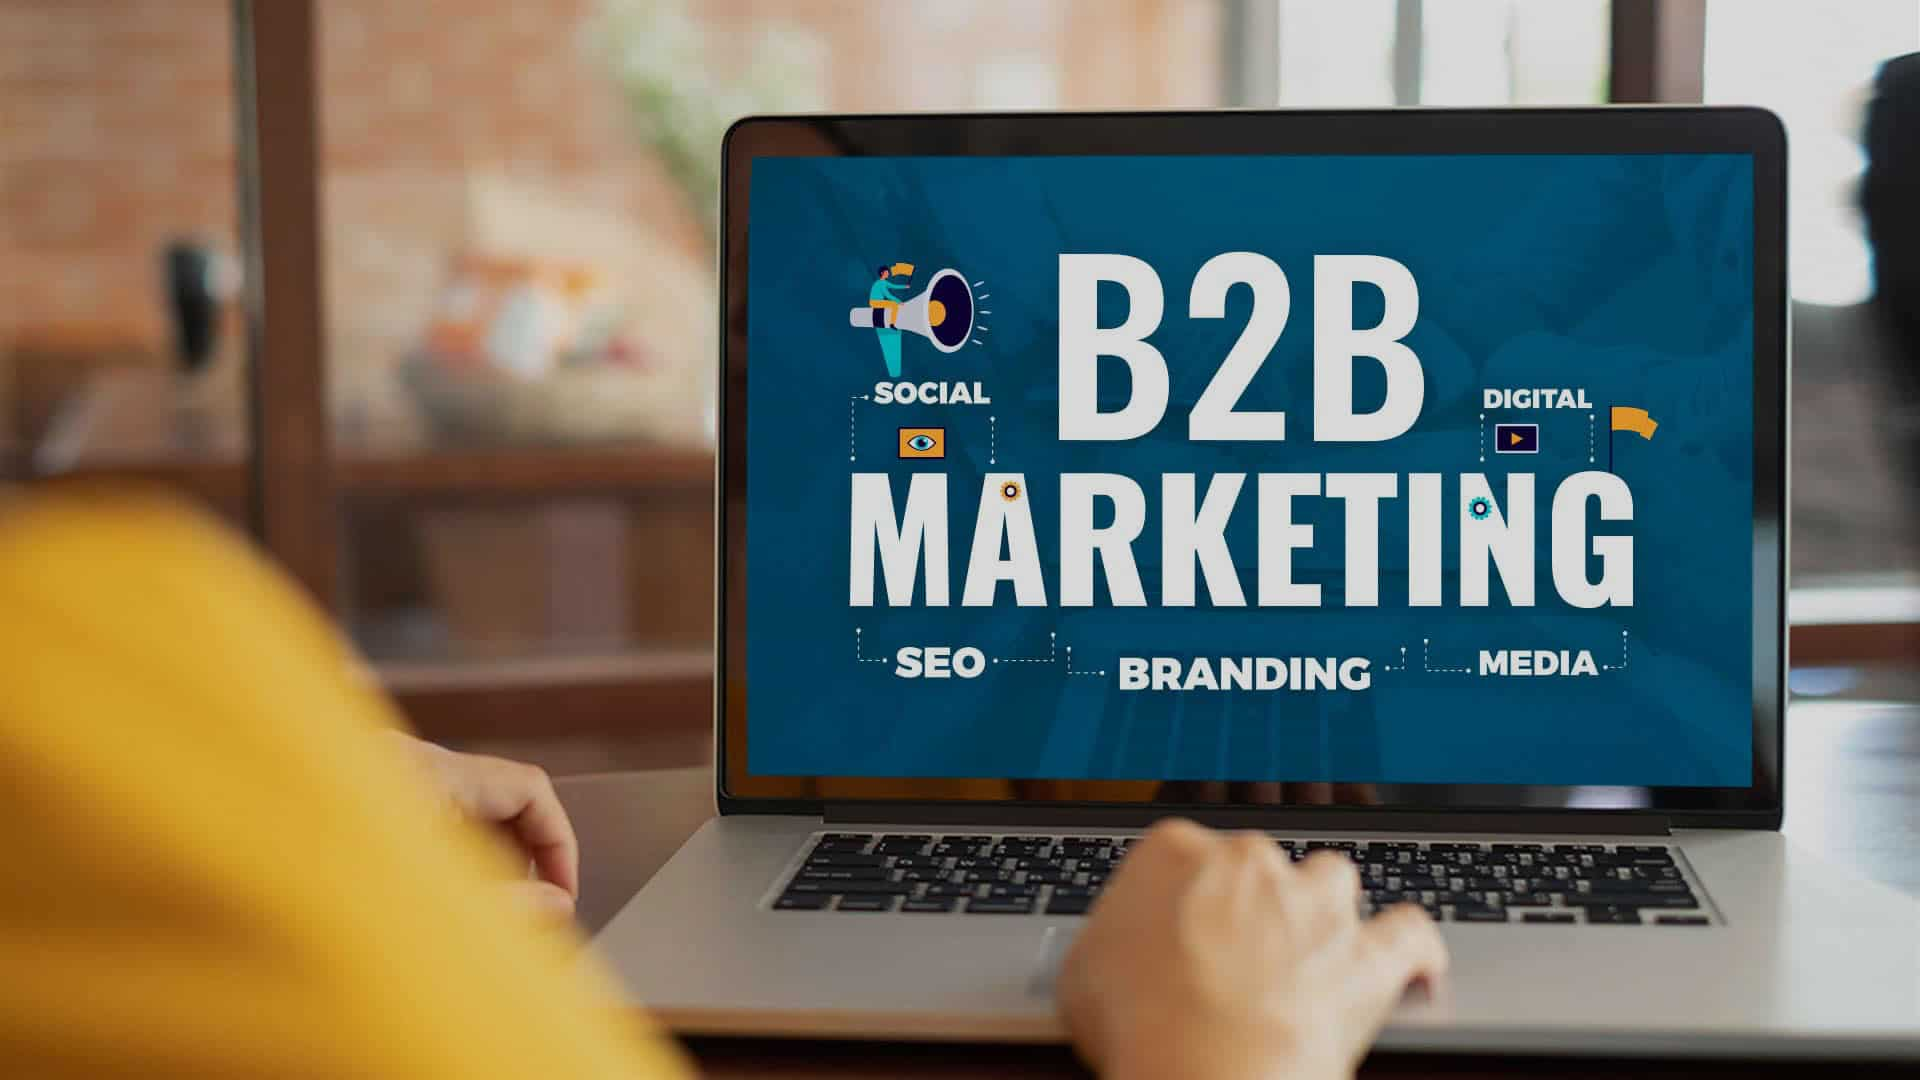 Digital media and the B2B segment